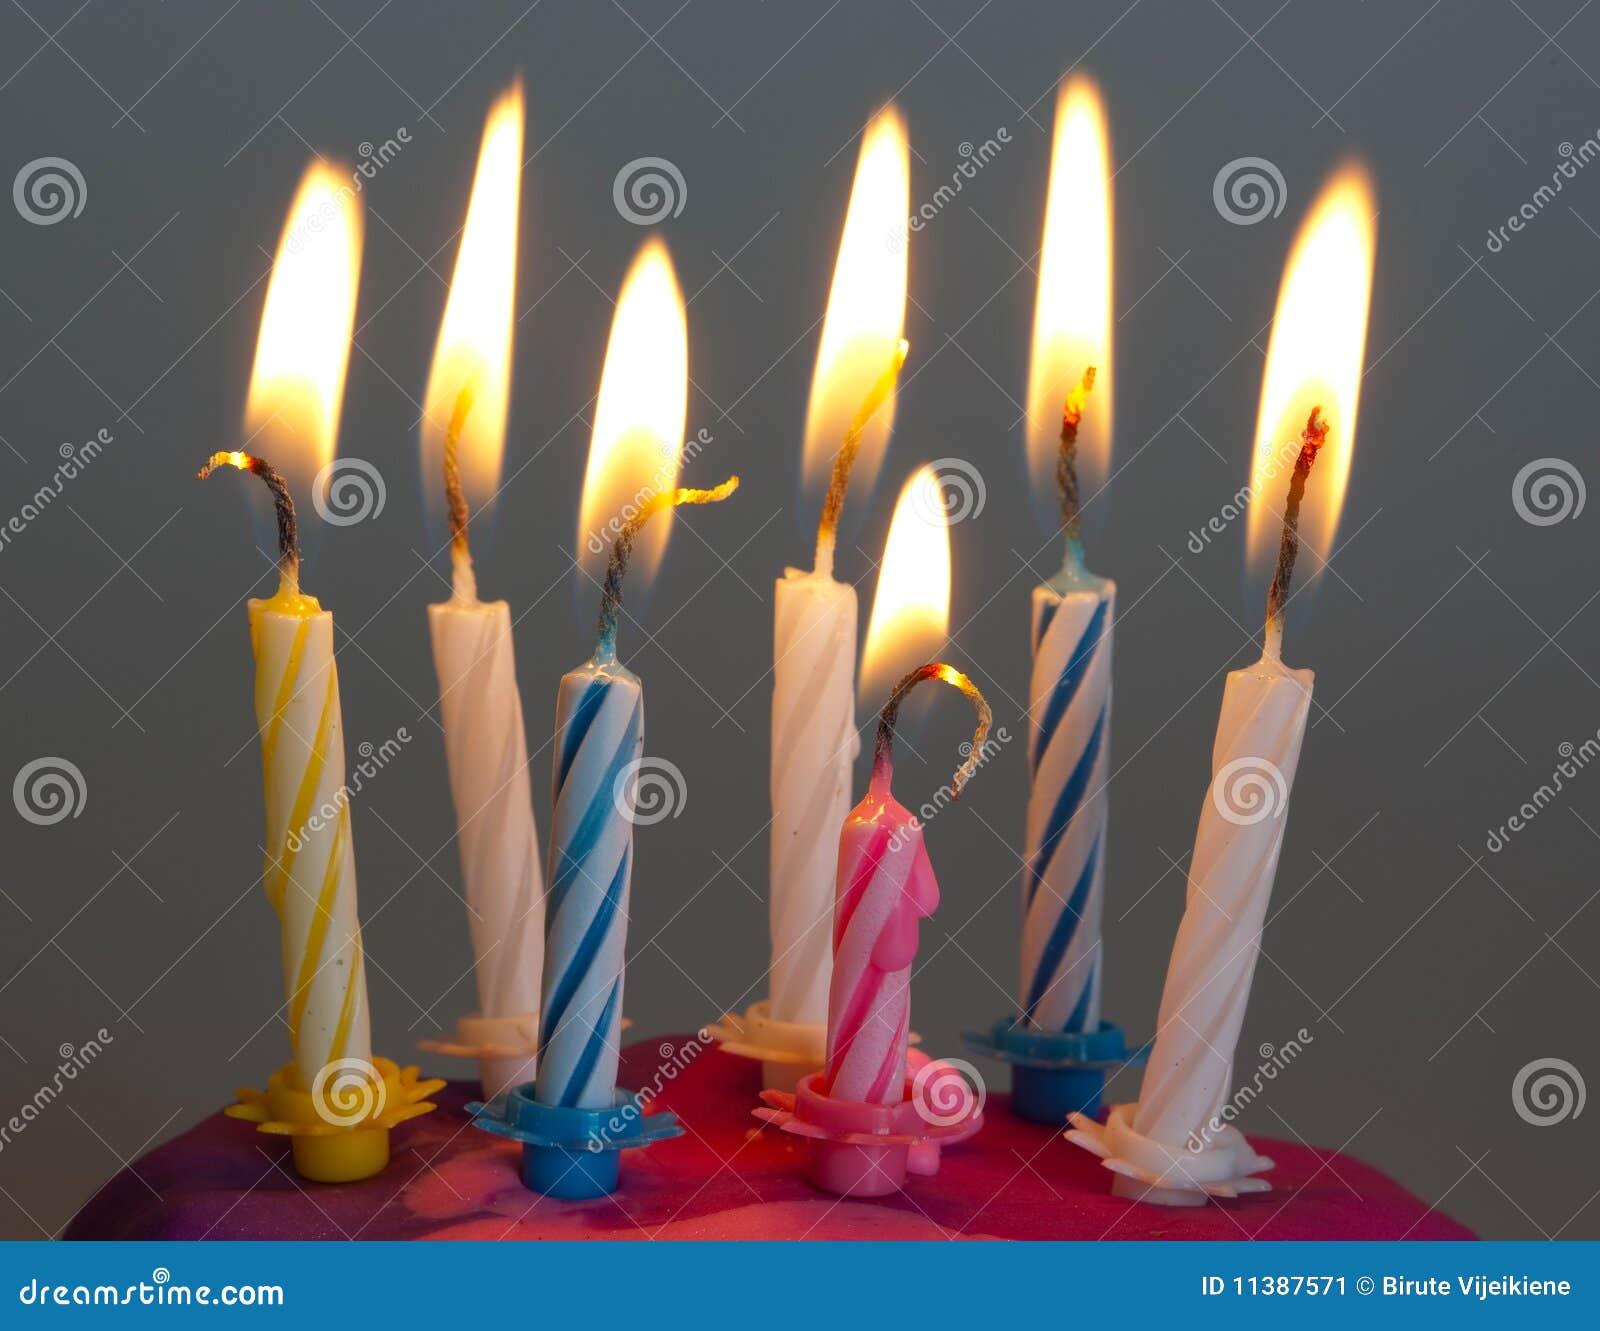 Birthday Candles Burning Stock Image Image Of Natal